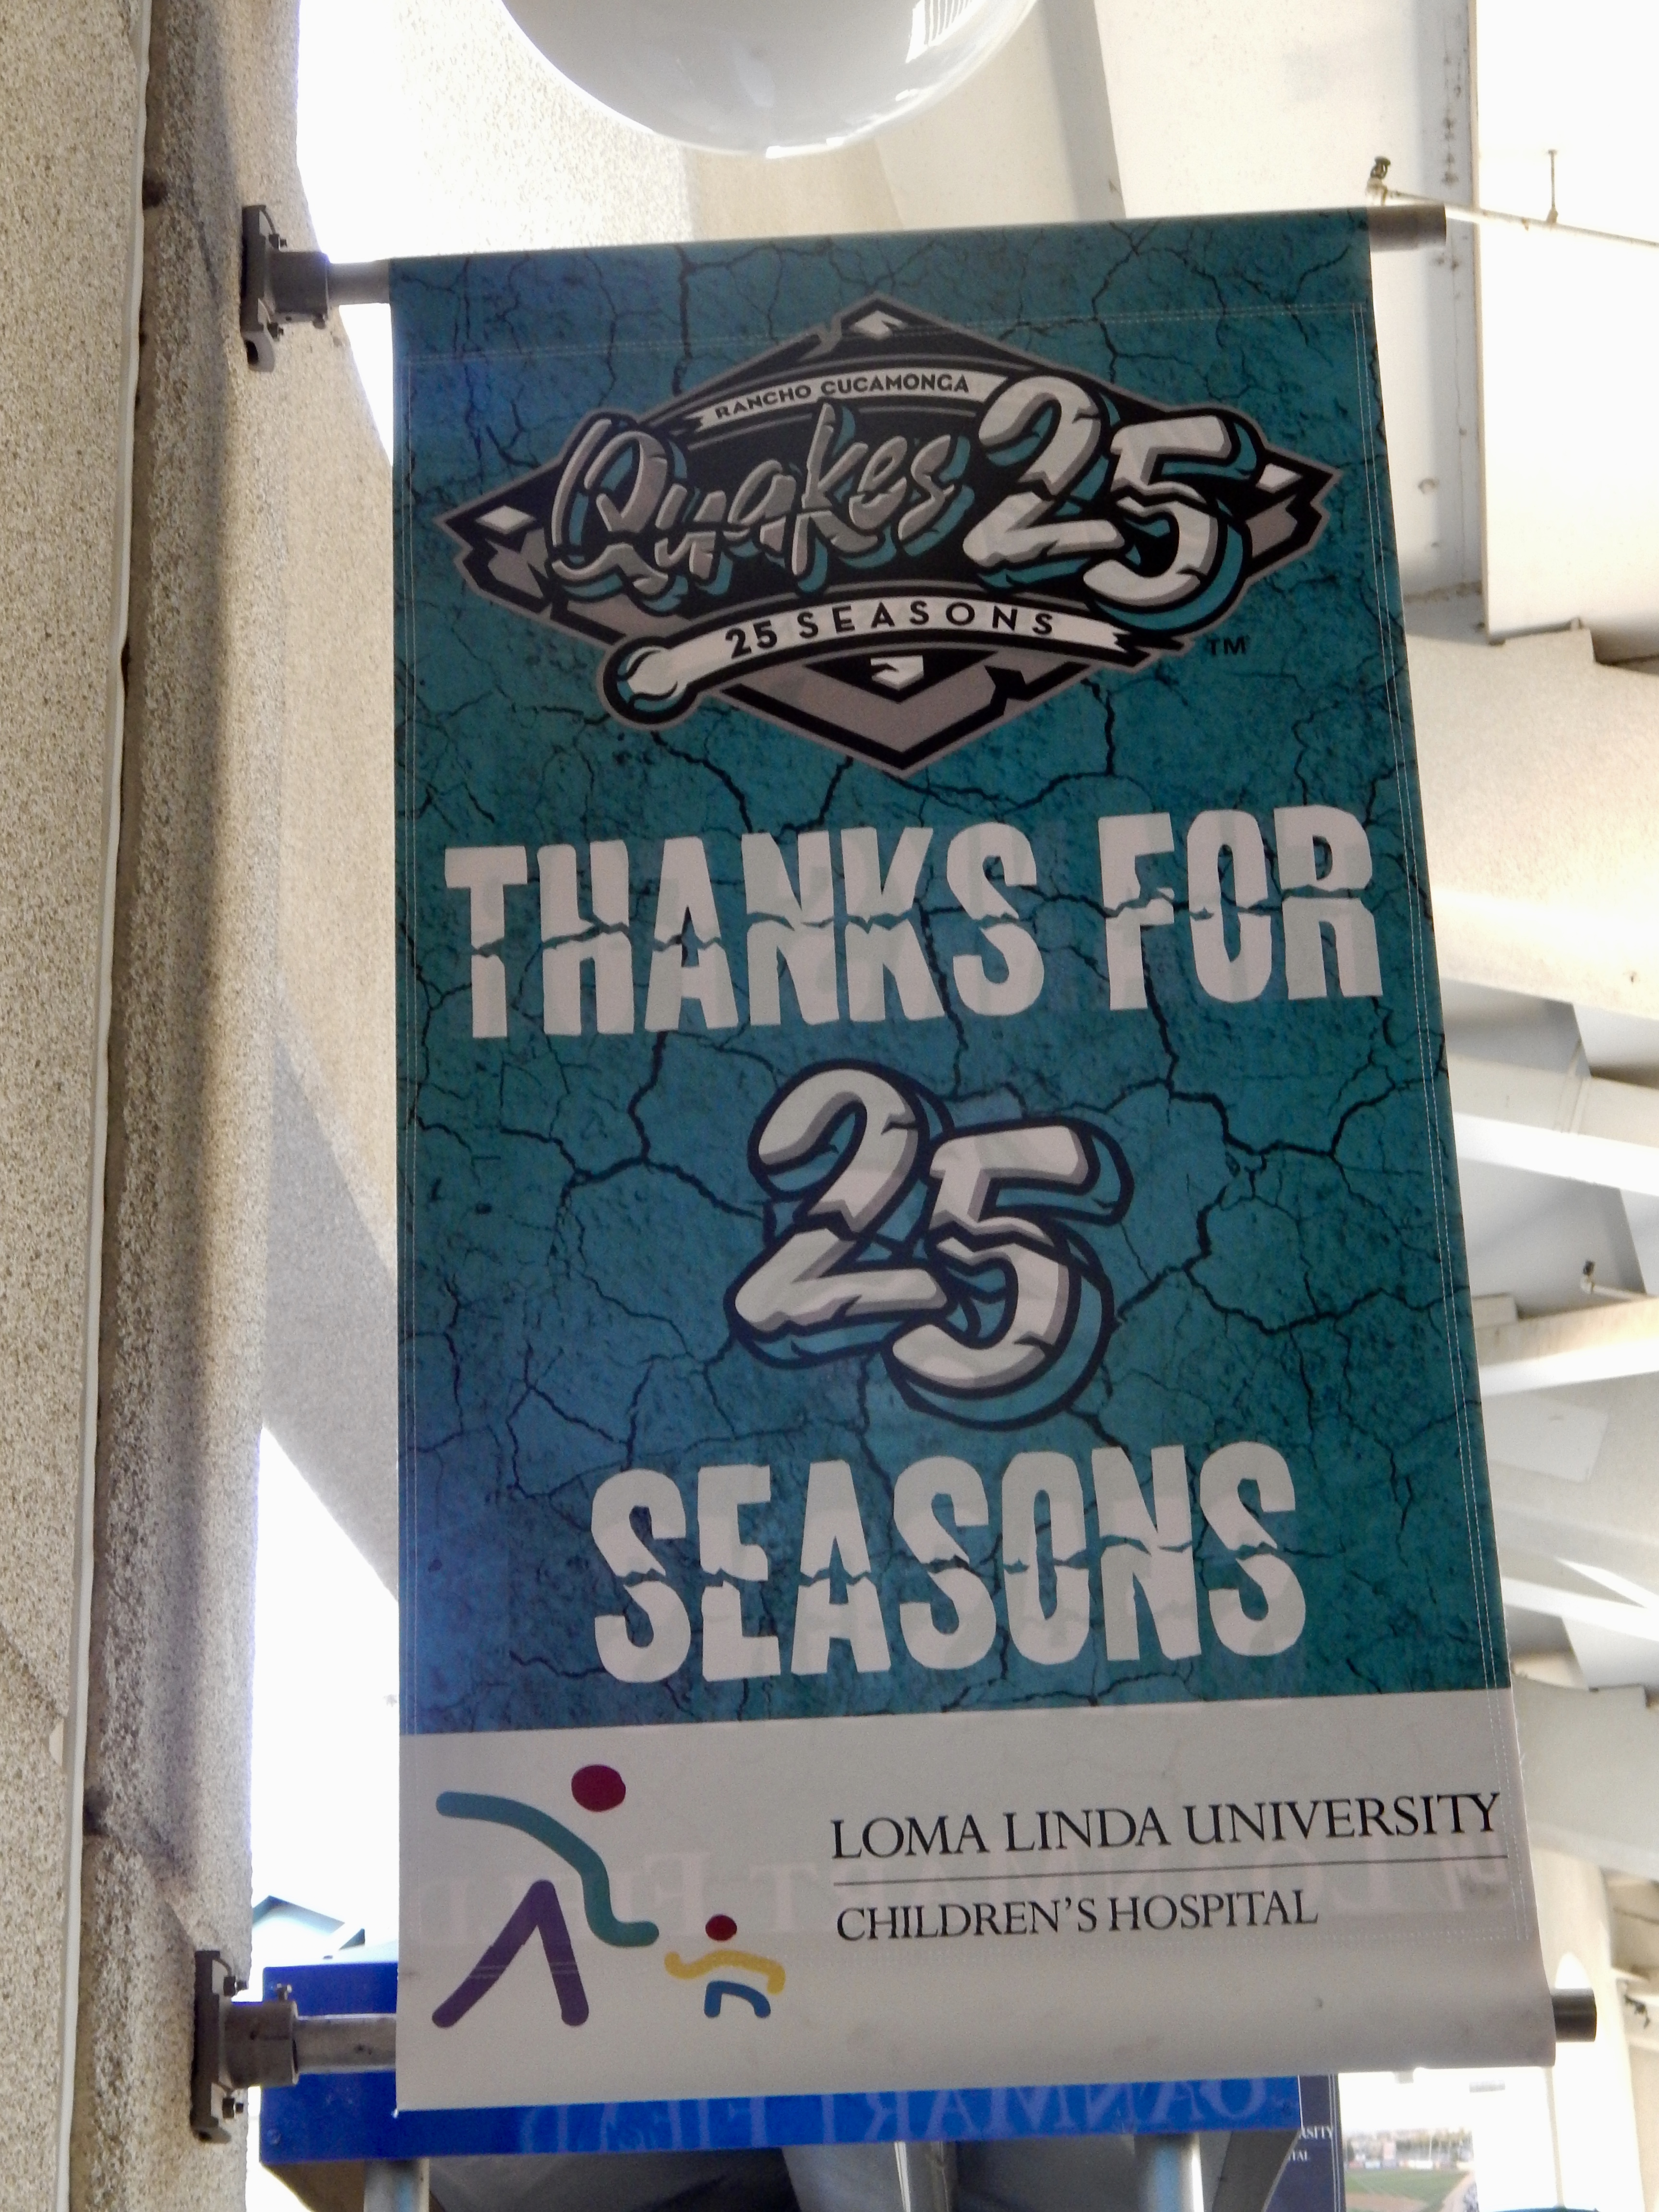 RC Quakes celebrate 25th season